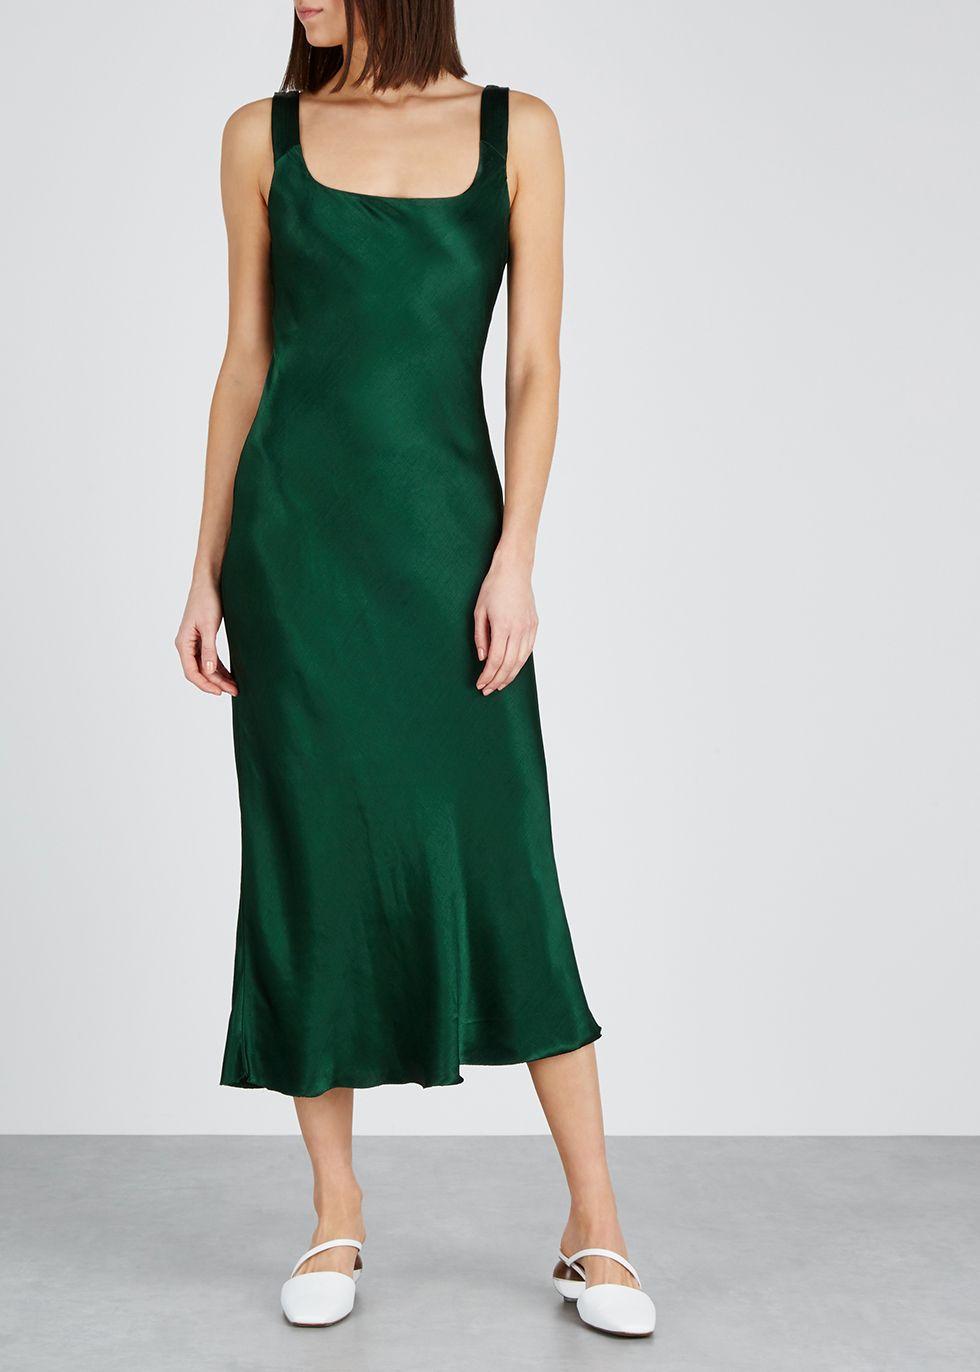 Martini Forest Green Satin Dress Bec Bridge Green Satin Dress Satin Midi Dress Contemporary Outfits [ 1372 x 980 Pixel ]